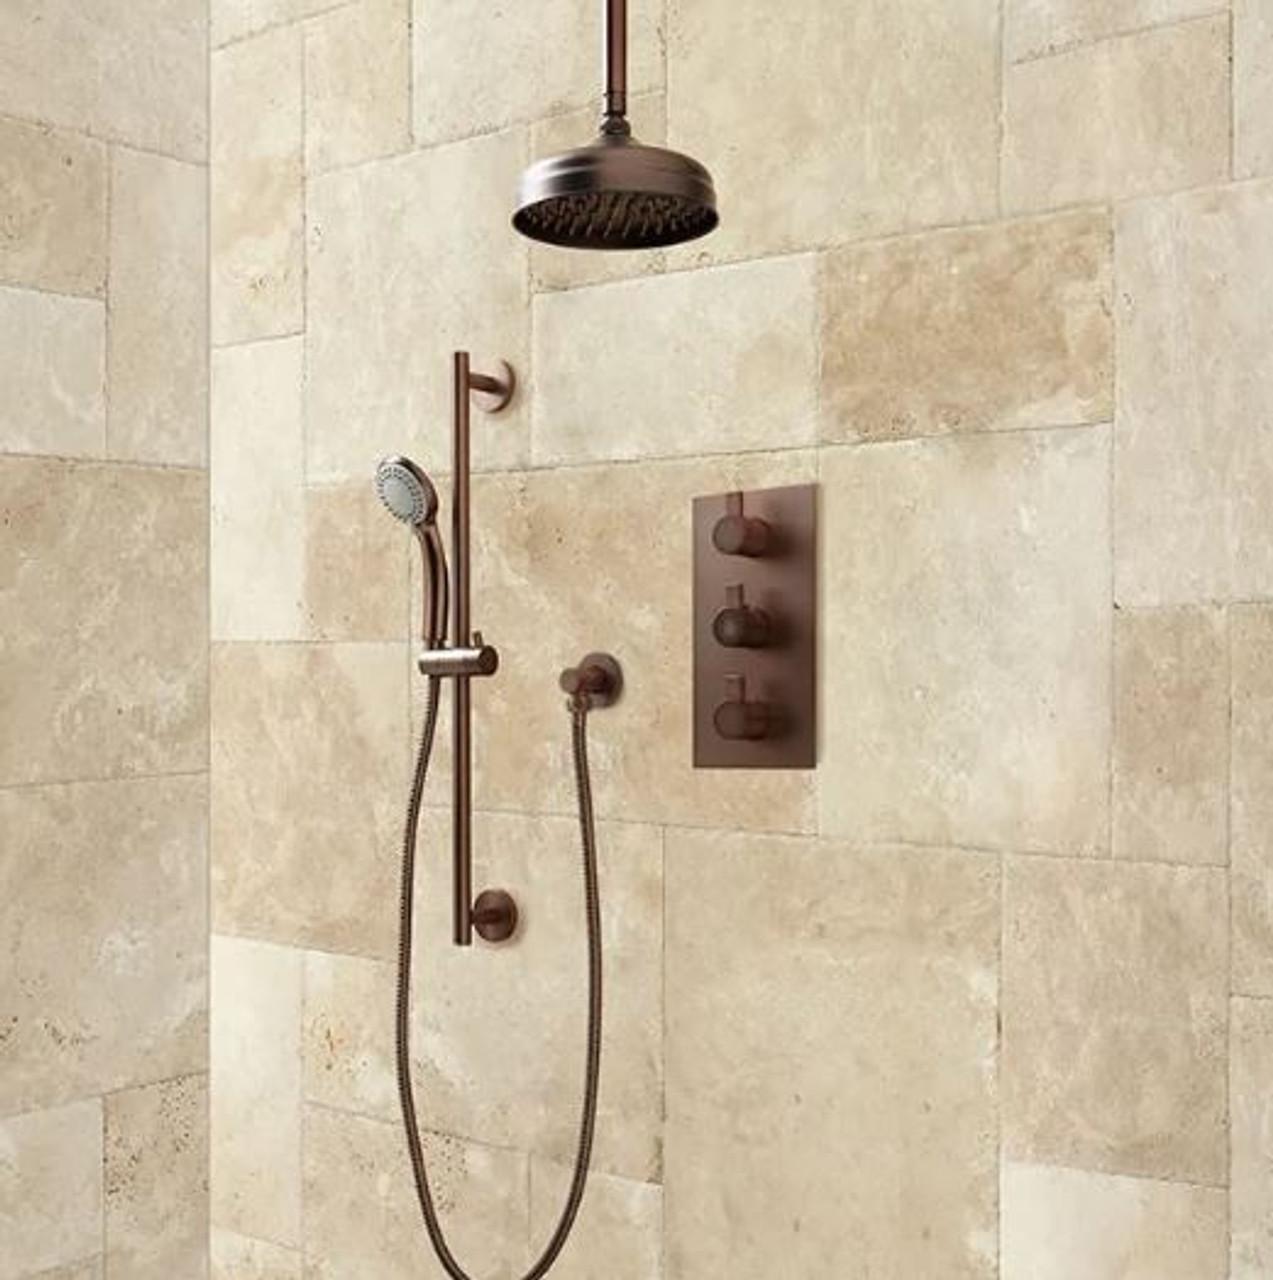 Signature Hardware Isola Thermostatic Shower System 12 Rain Shower Hand Shower Royal Bath Place